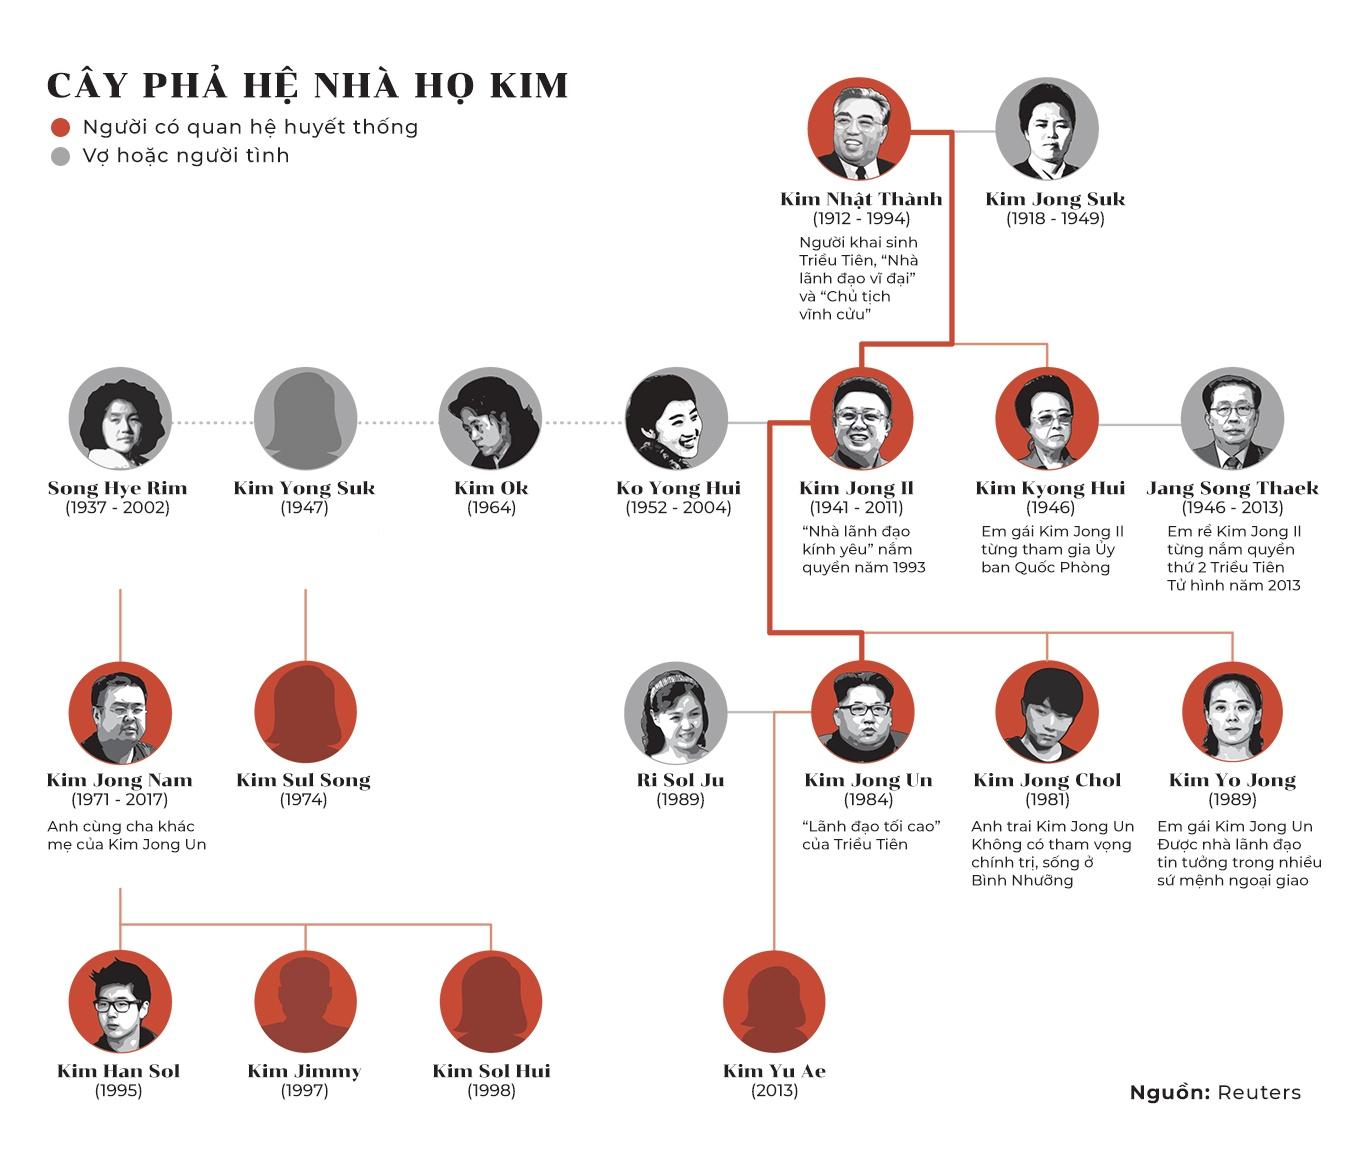 Kim Jong Un - tu tuong 4 sao toi nam van menh cua Trieu Tien hinh anh 7